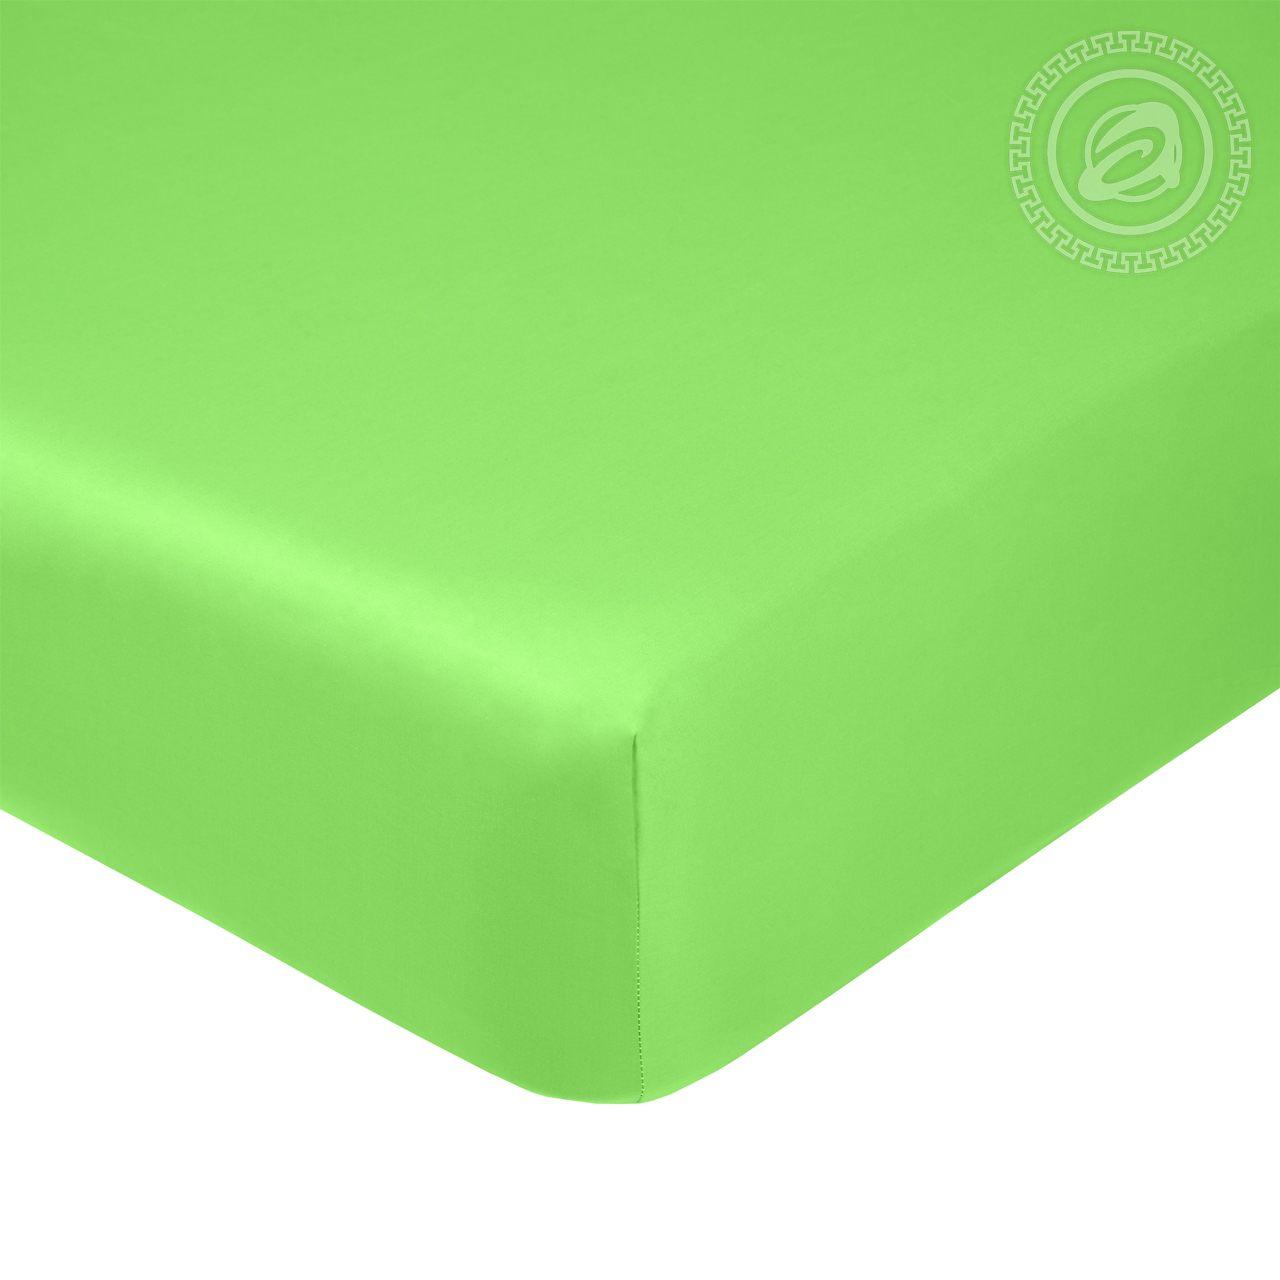 Фото - Простыня на резинке iv61985 (сатин) (140х200) простыня на резинке 140х200 см поплин браво м507 12 04